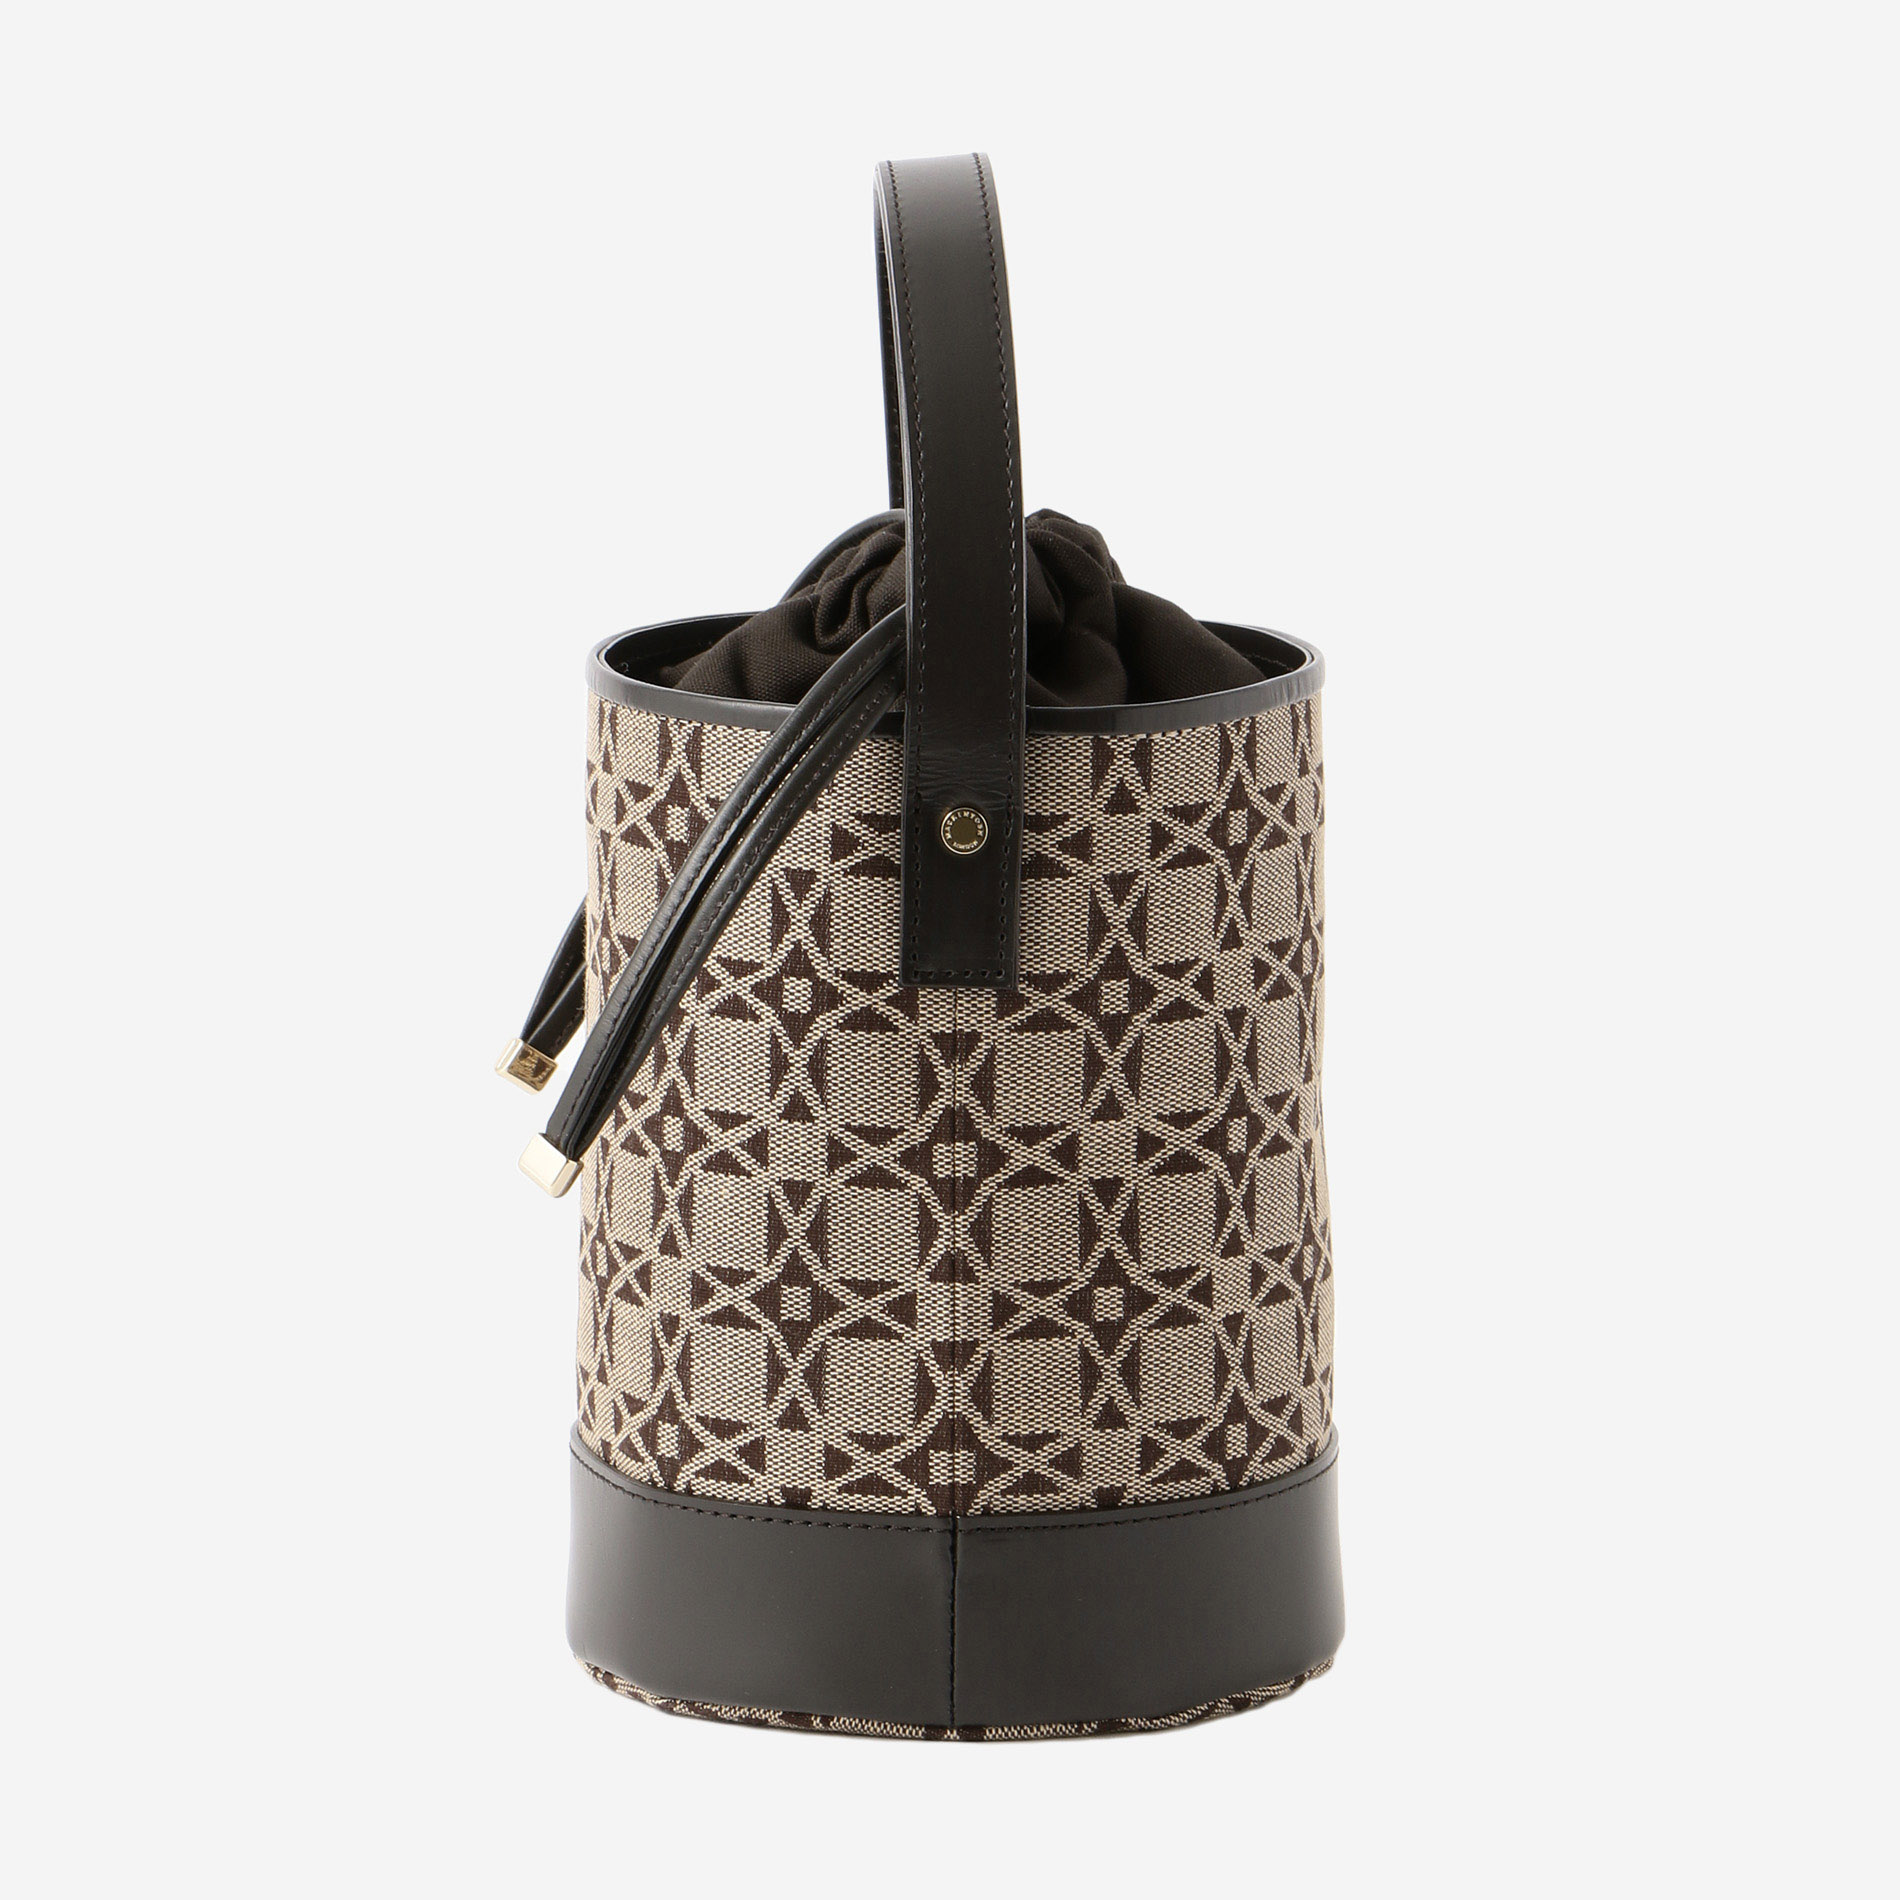 ANDREWジャガードバケットバッグ